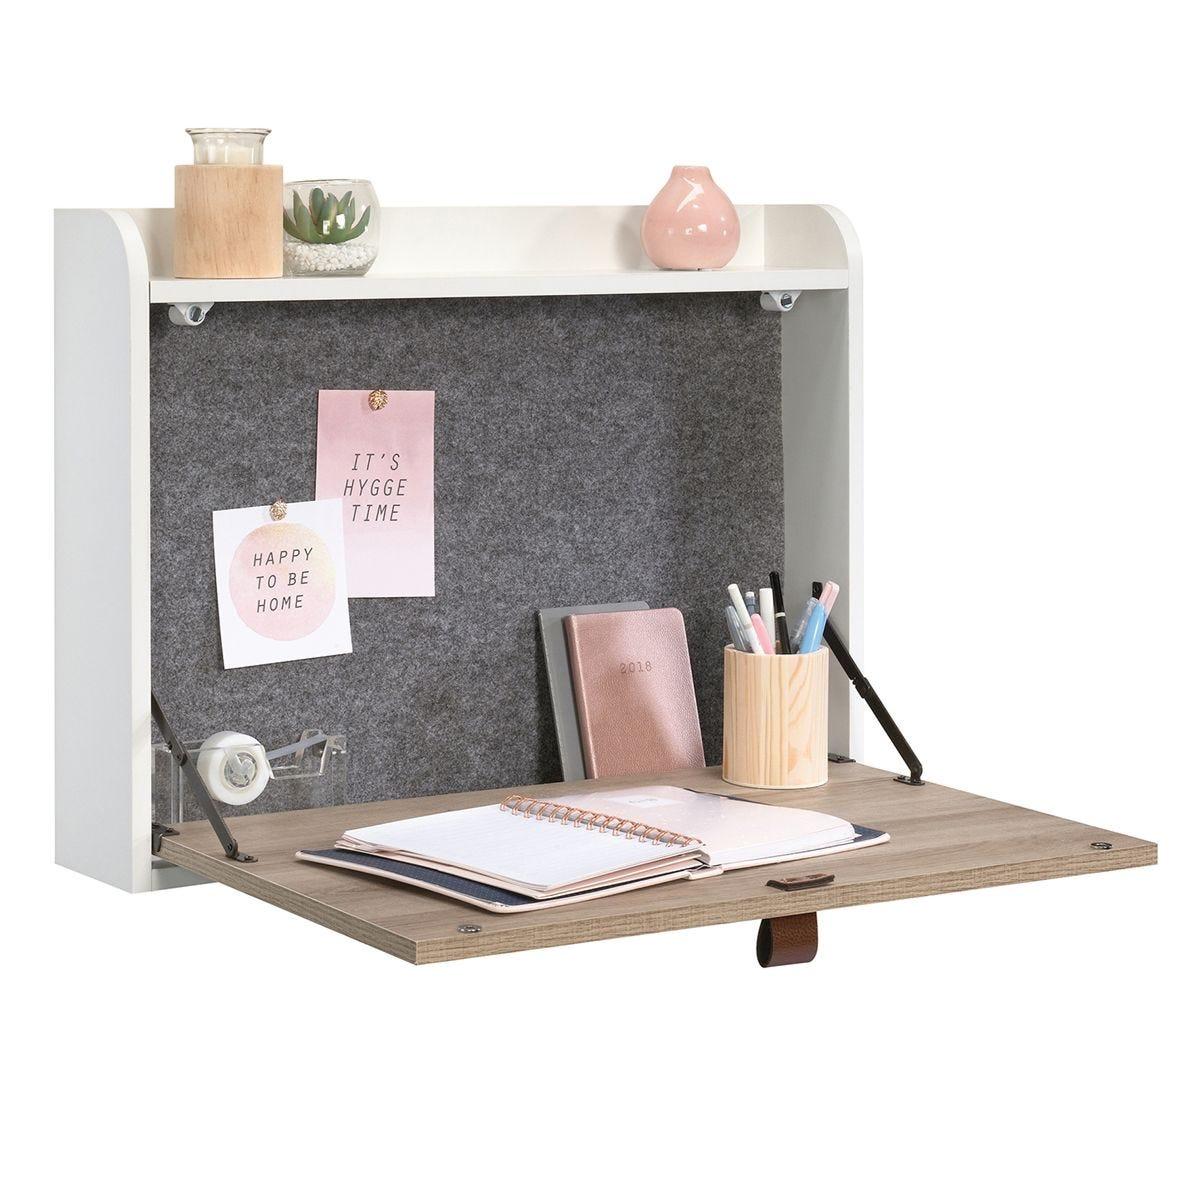 Teknik Avon Leather Handled Wall Desk - White/Oak